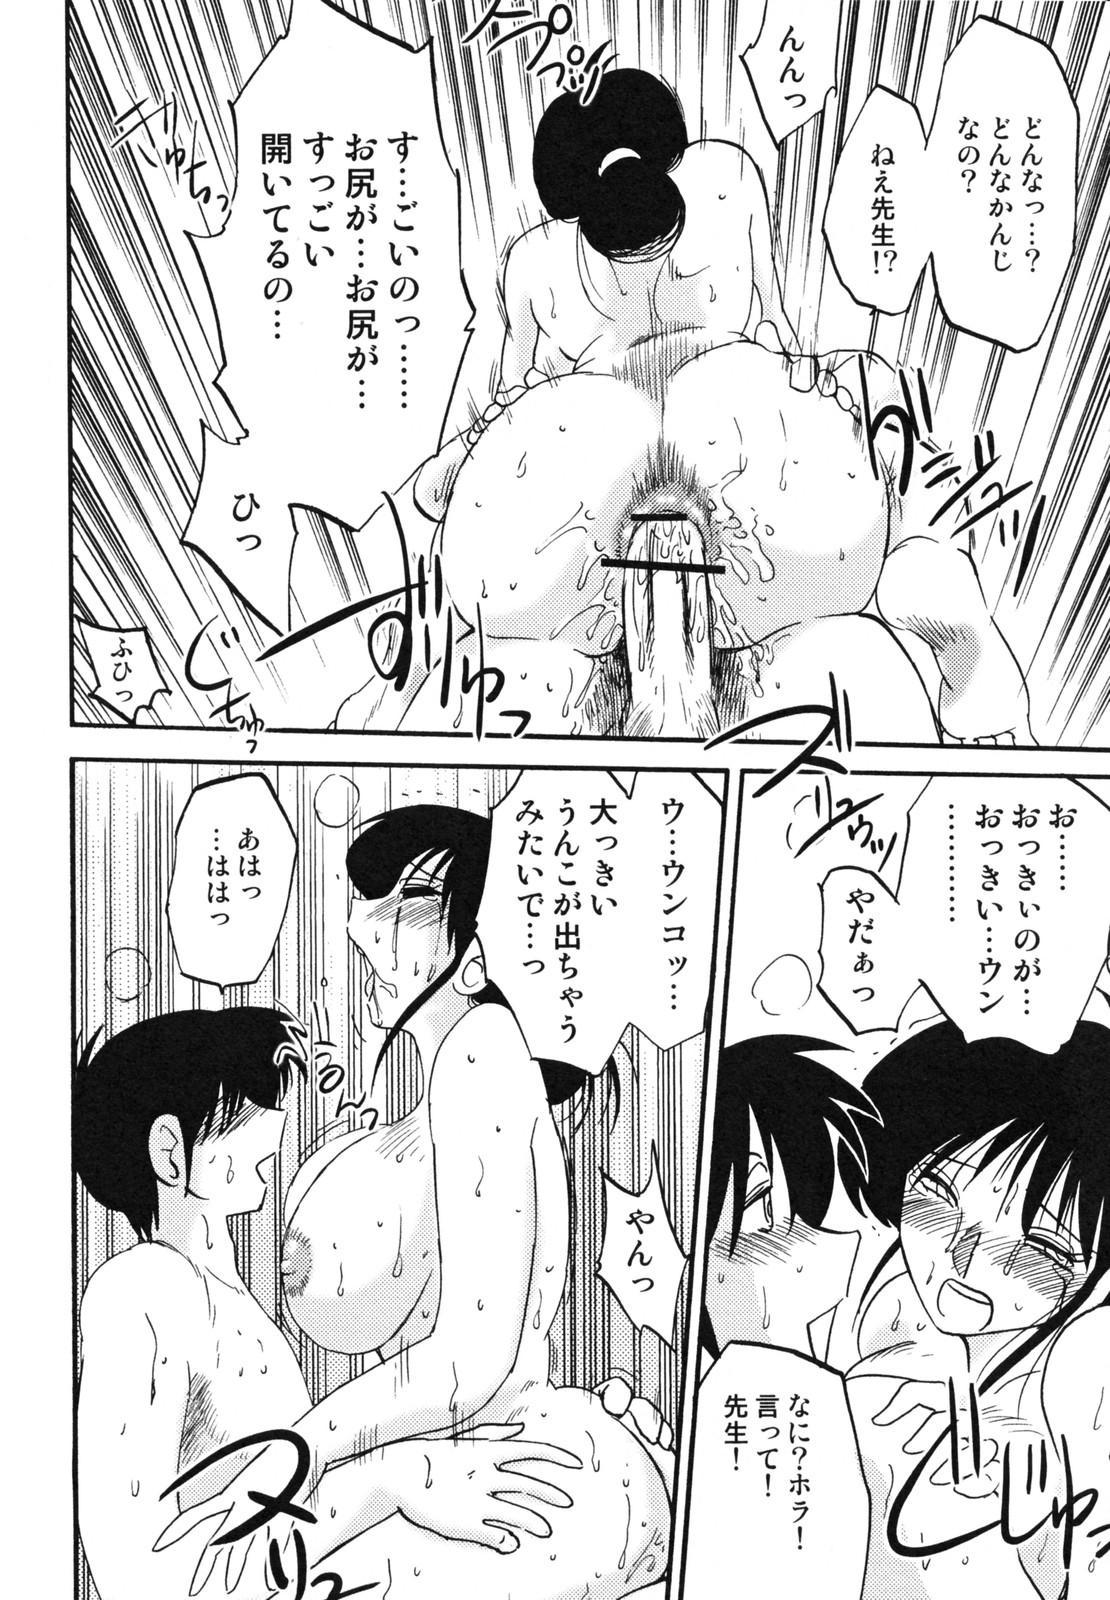 Hisae Haitoku Nikki Kanzenban Jou 153